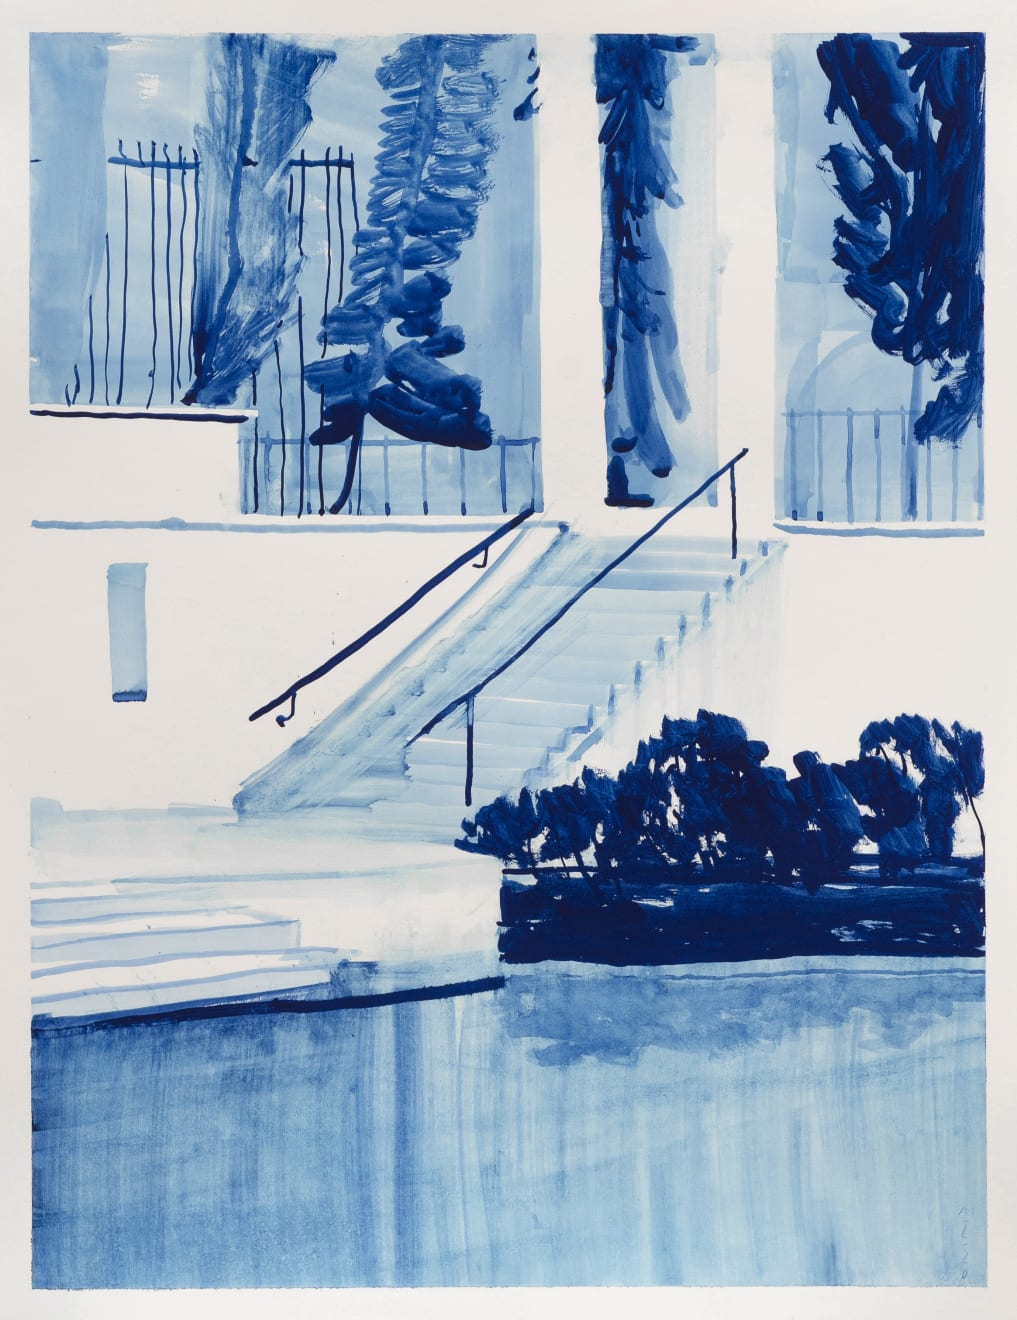 Michael Taylor The Pastel Ghost Gouache on Paper Original 65 x 50 cm $3000 £1500 SOLD